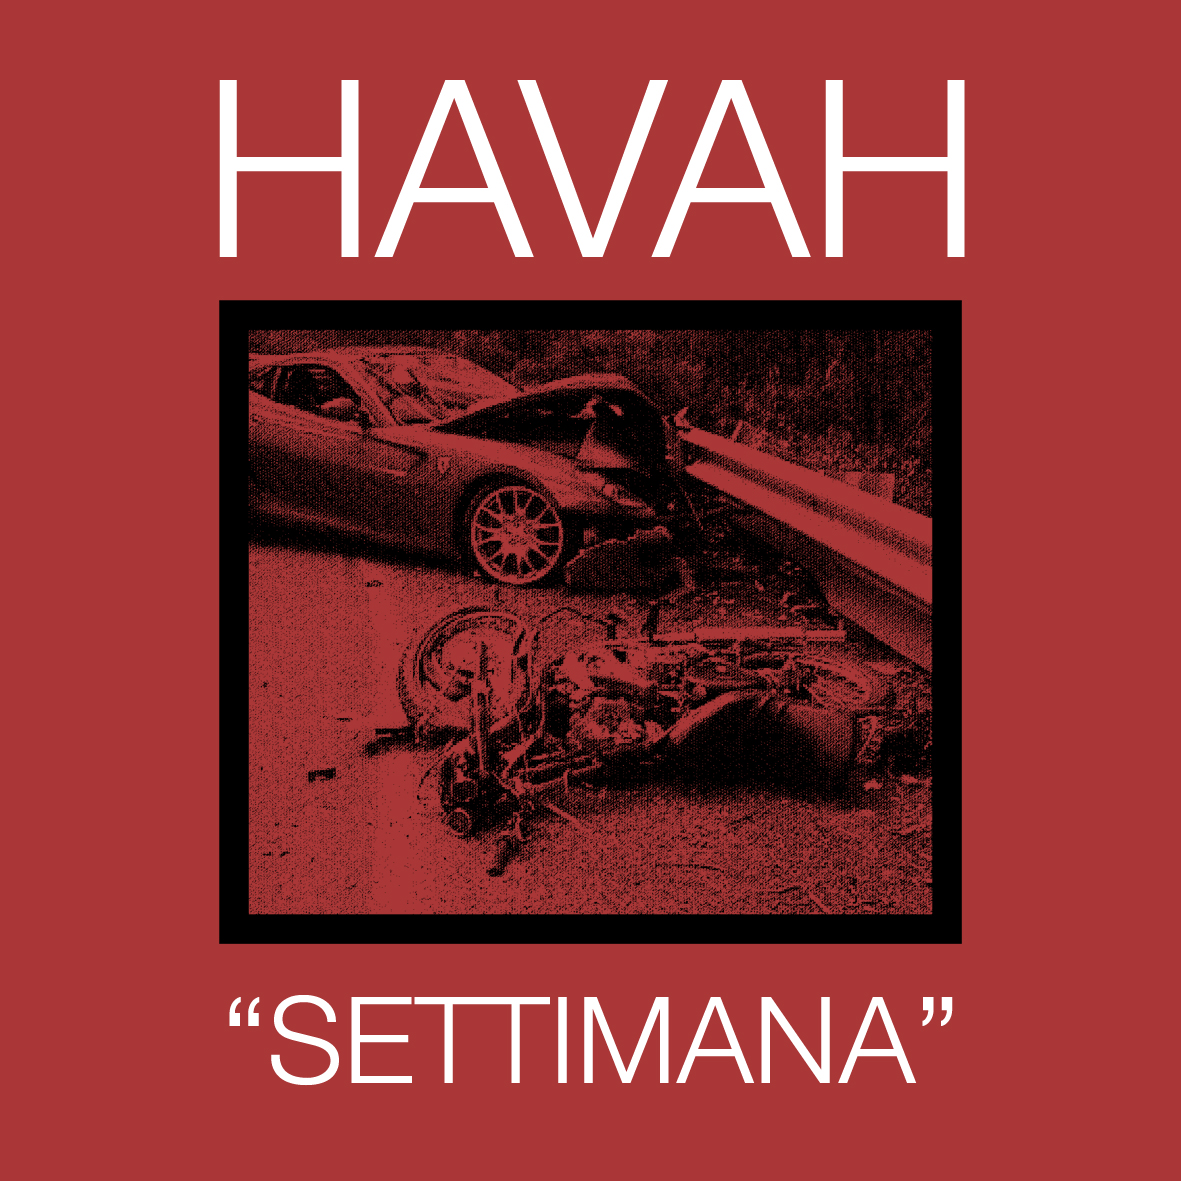 Havah - Settimana CD